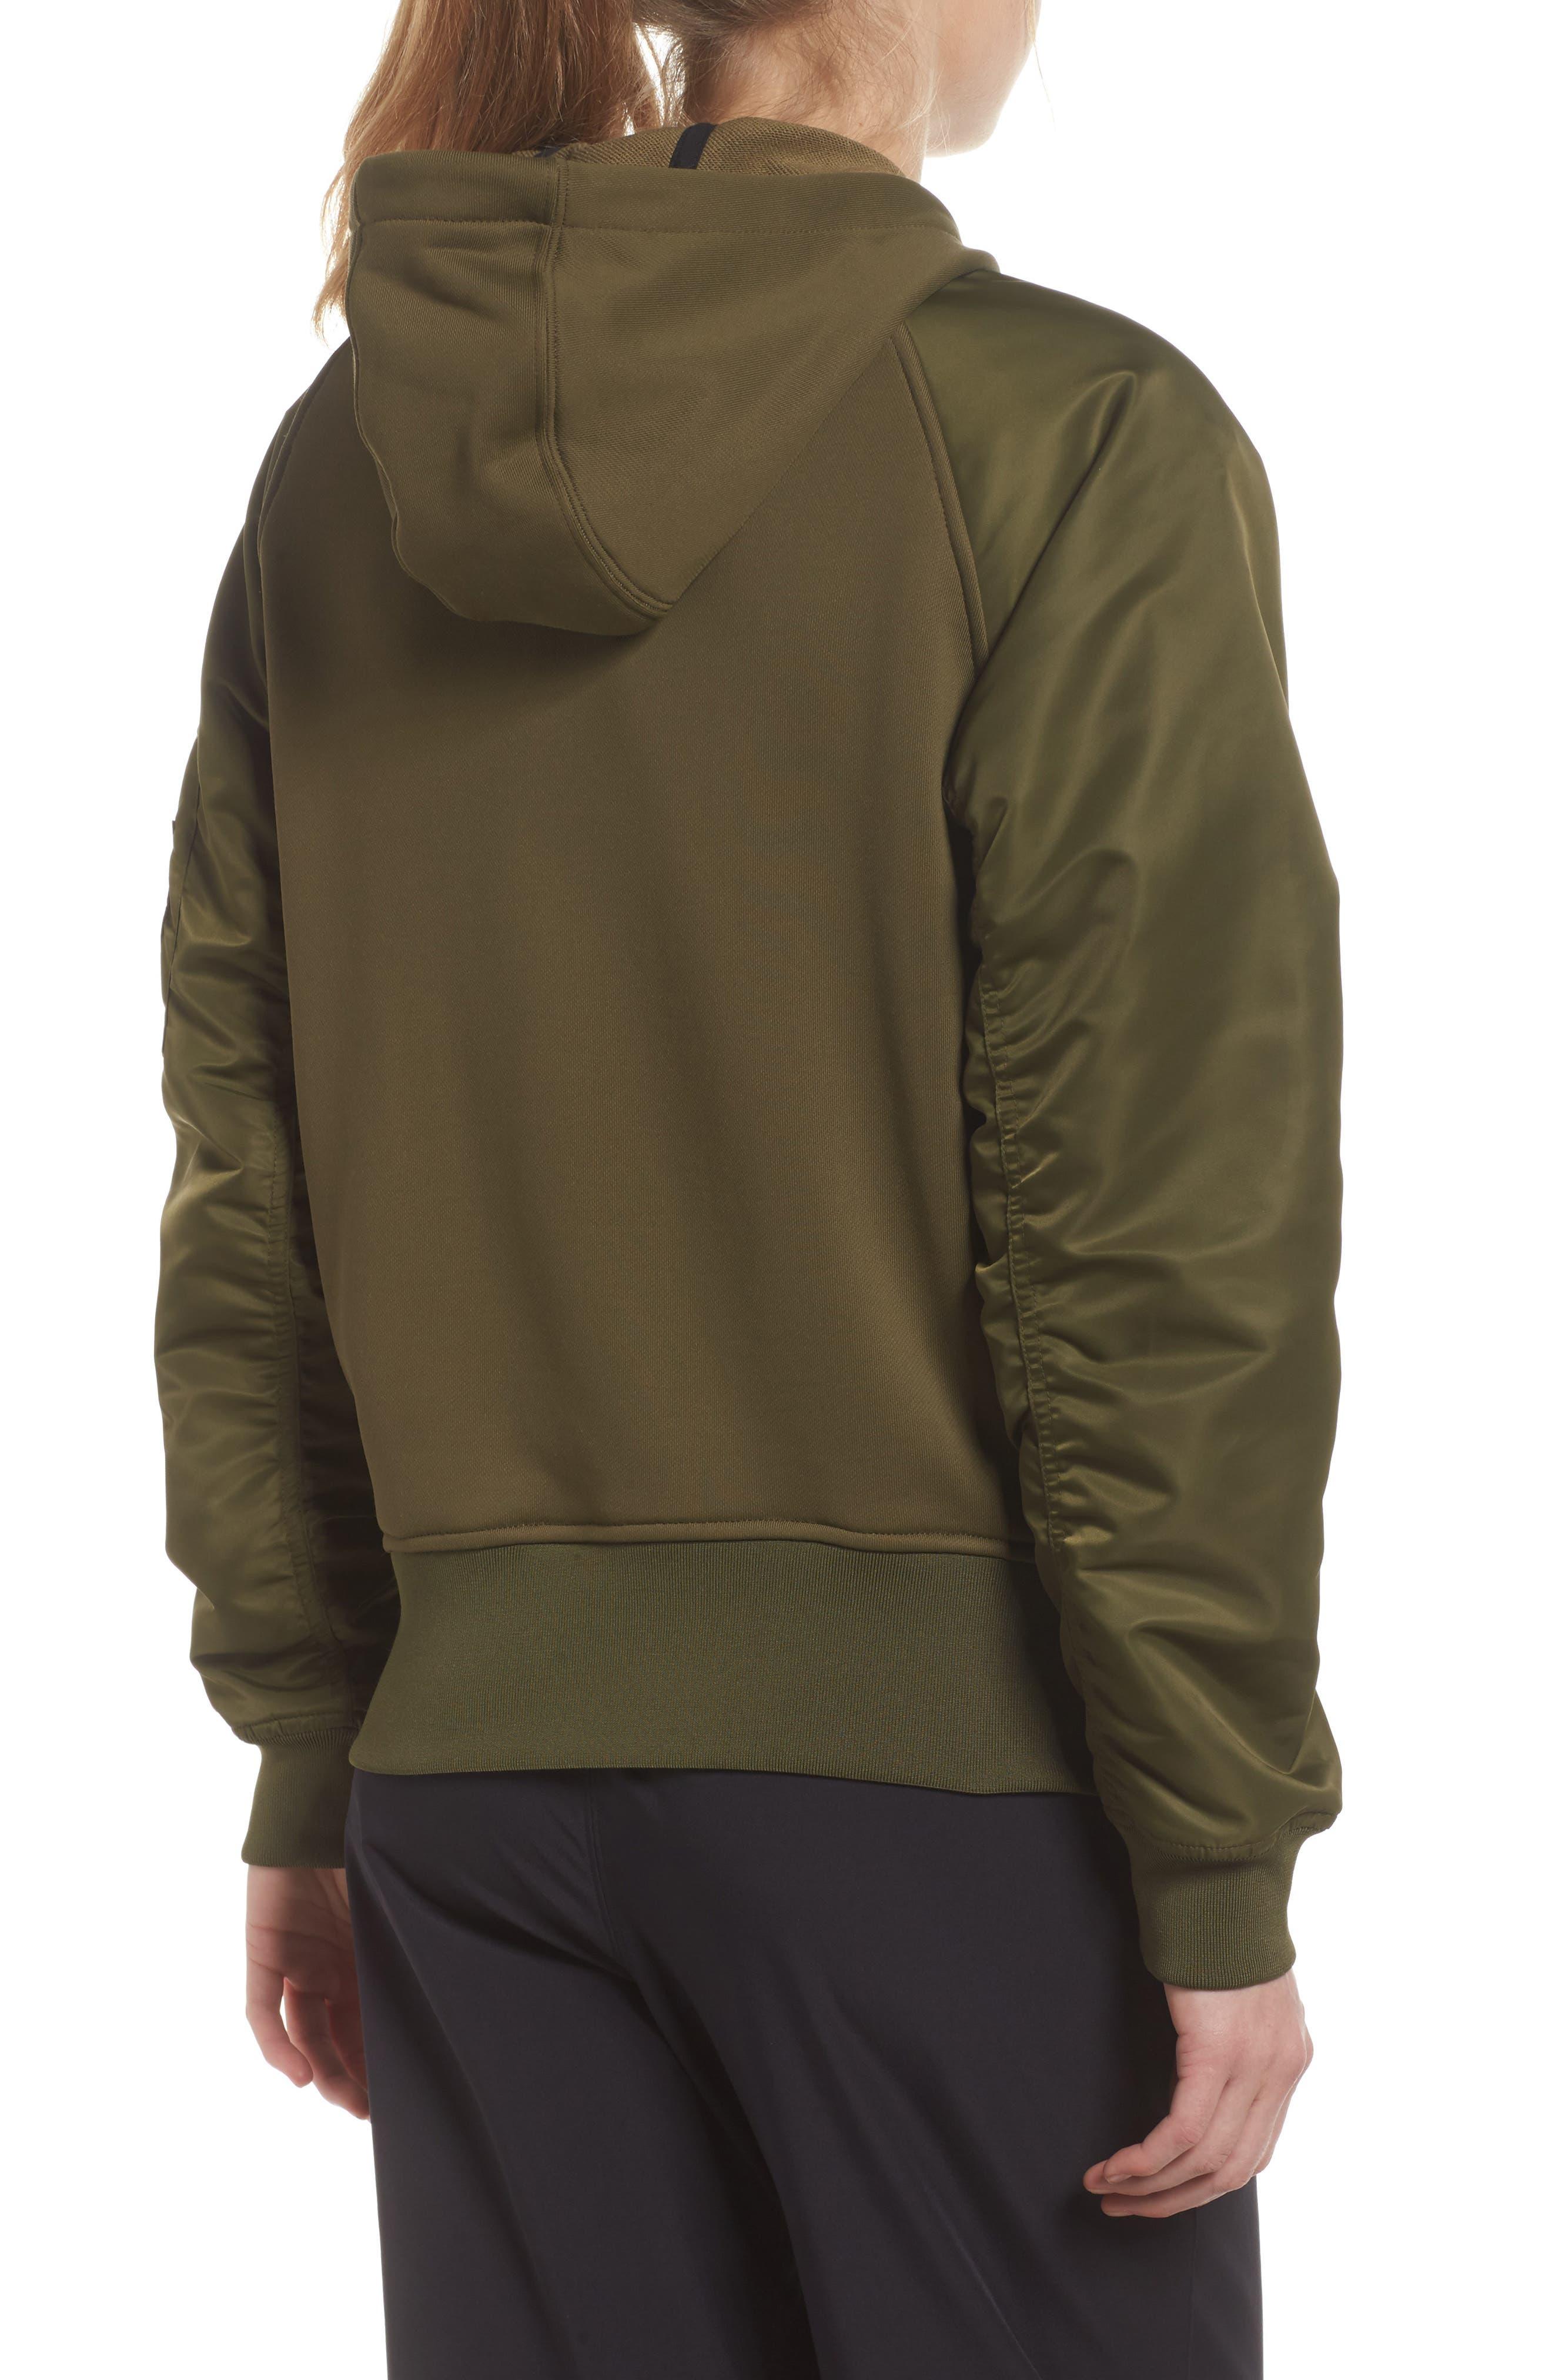 NikeLab Women's Mixed Media Bomber Jacket,                             Alternate thumbnail 2, color,                             Olive Canvas/ Black